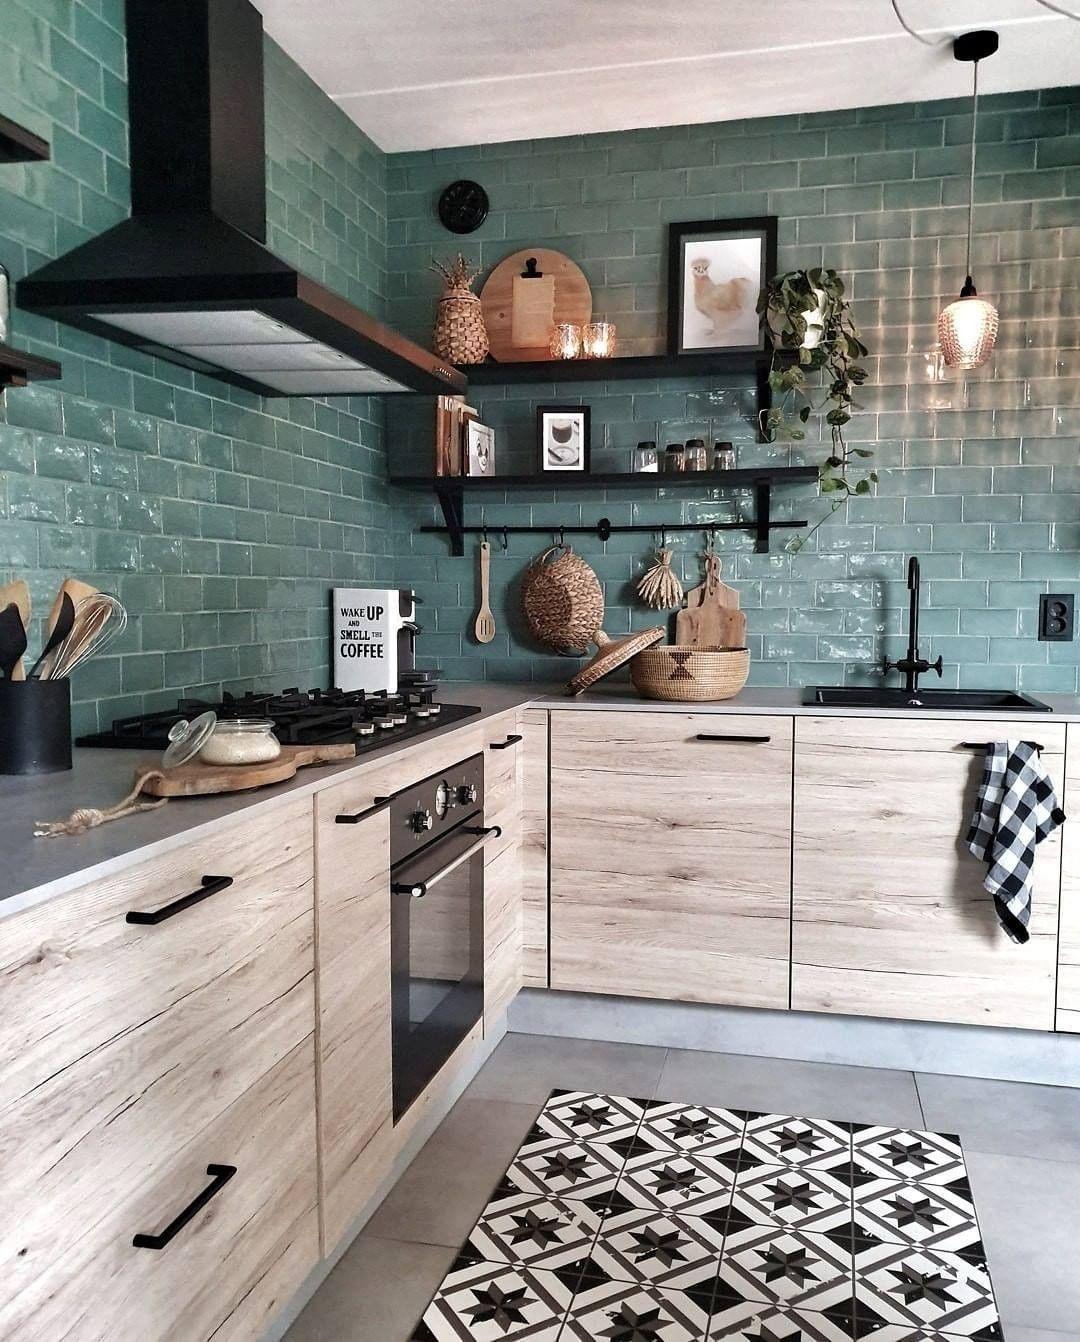 500 Nola Ideas In 2020 House Interior Nola New Orleans H